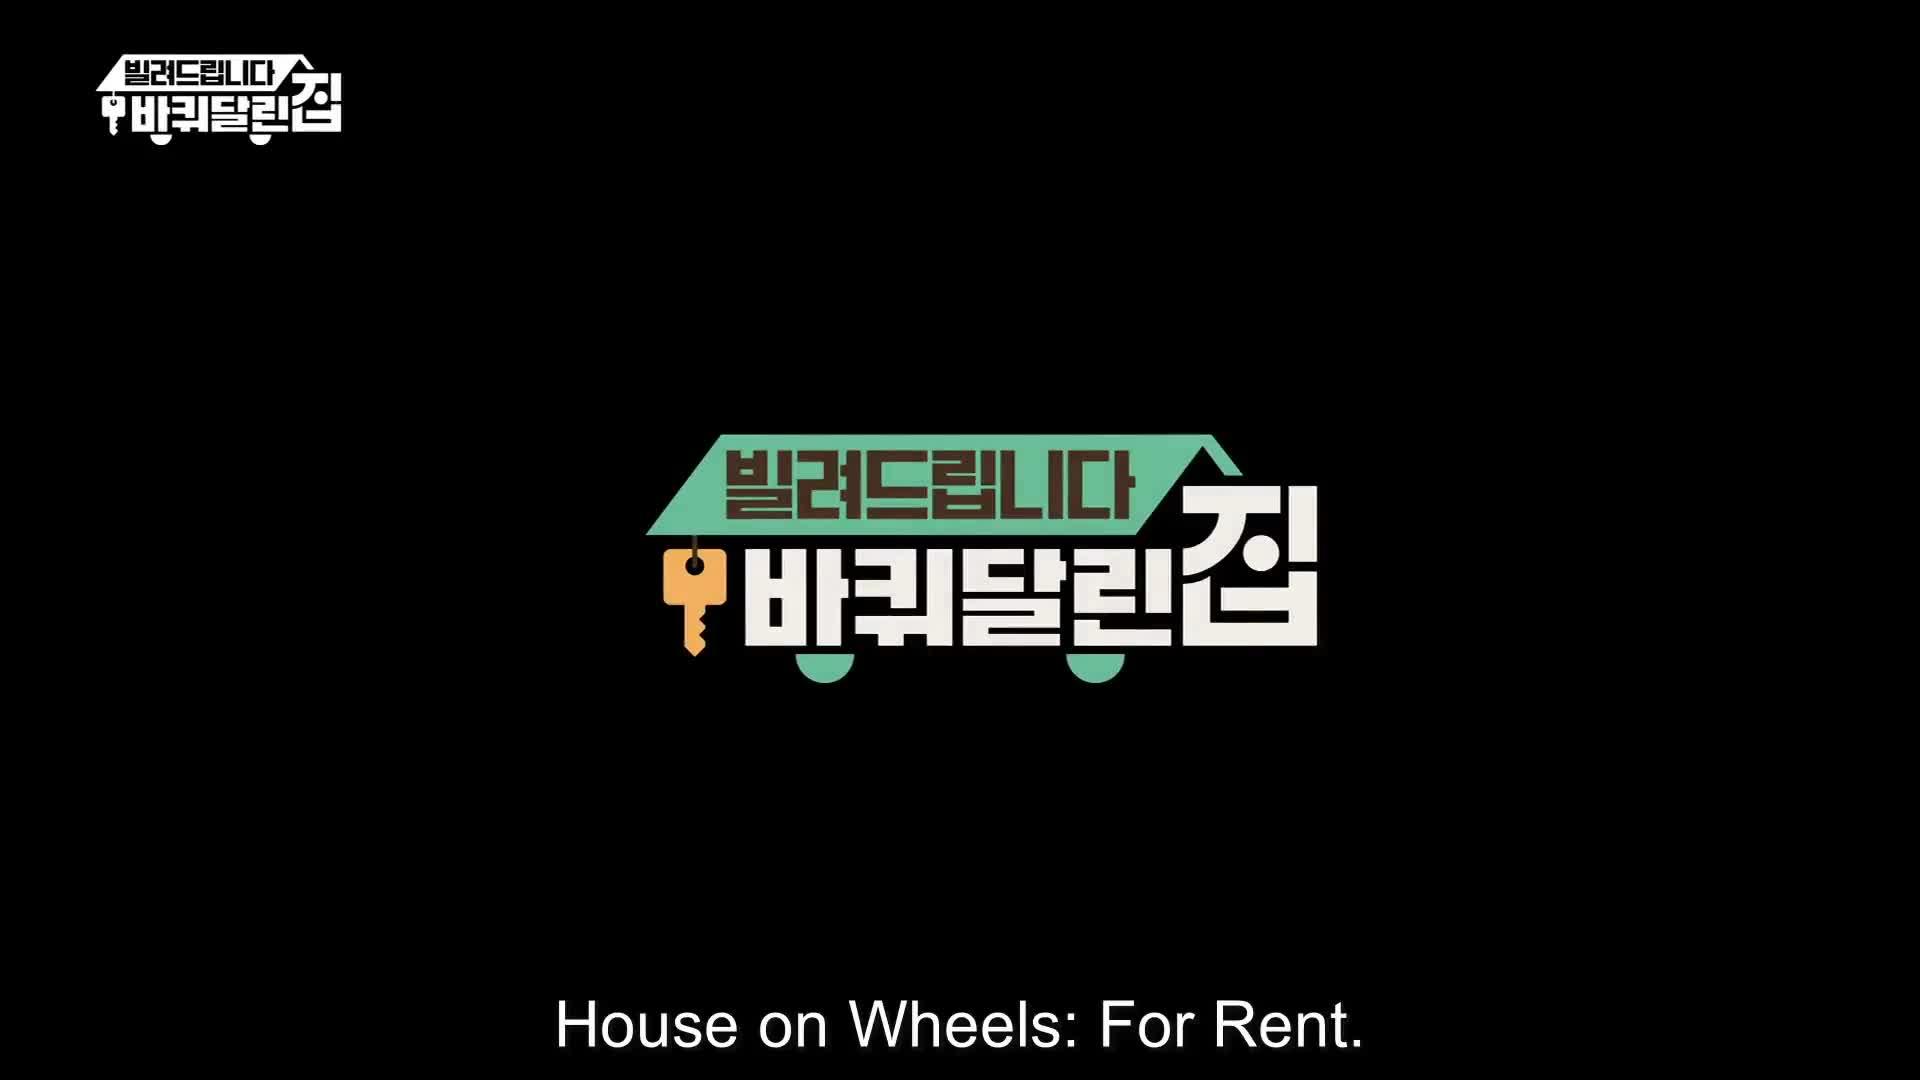 Lending You My House on Wheels (2021)